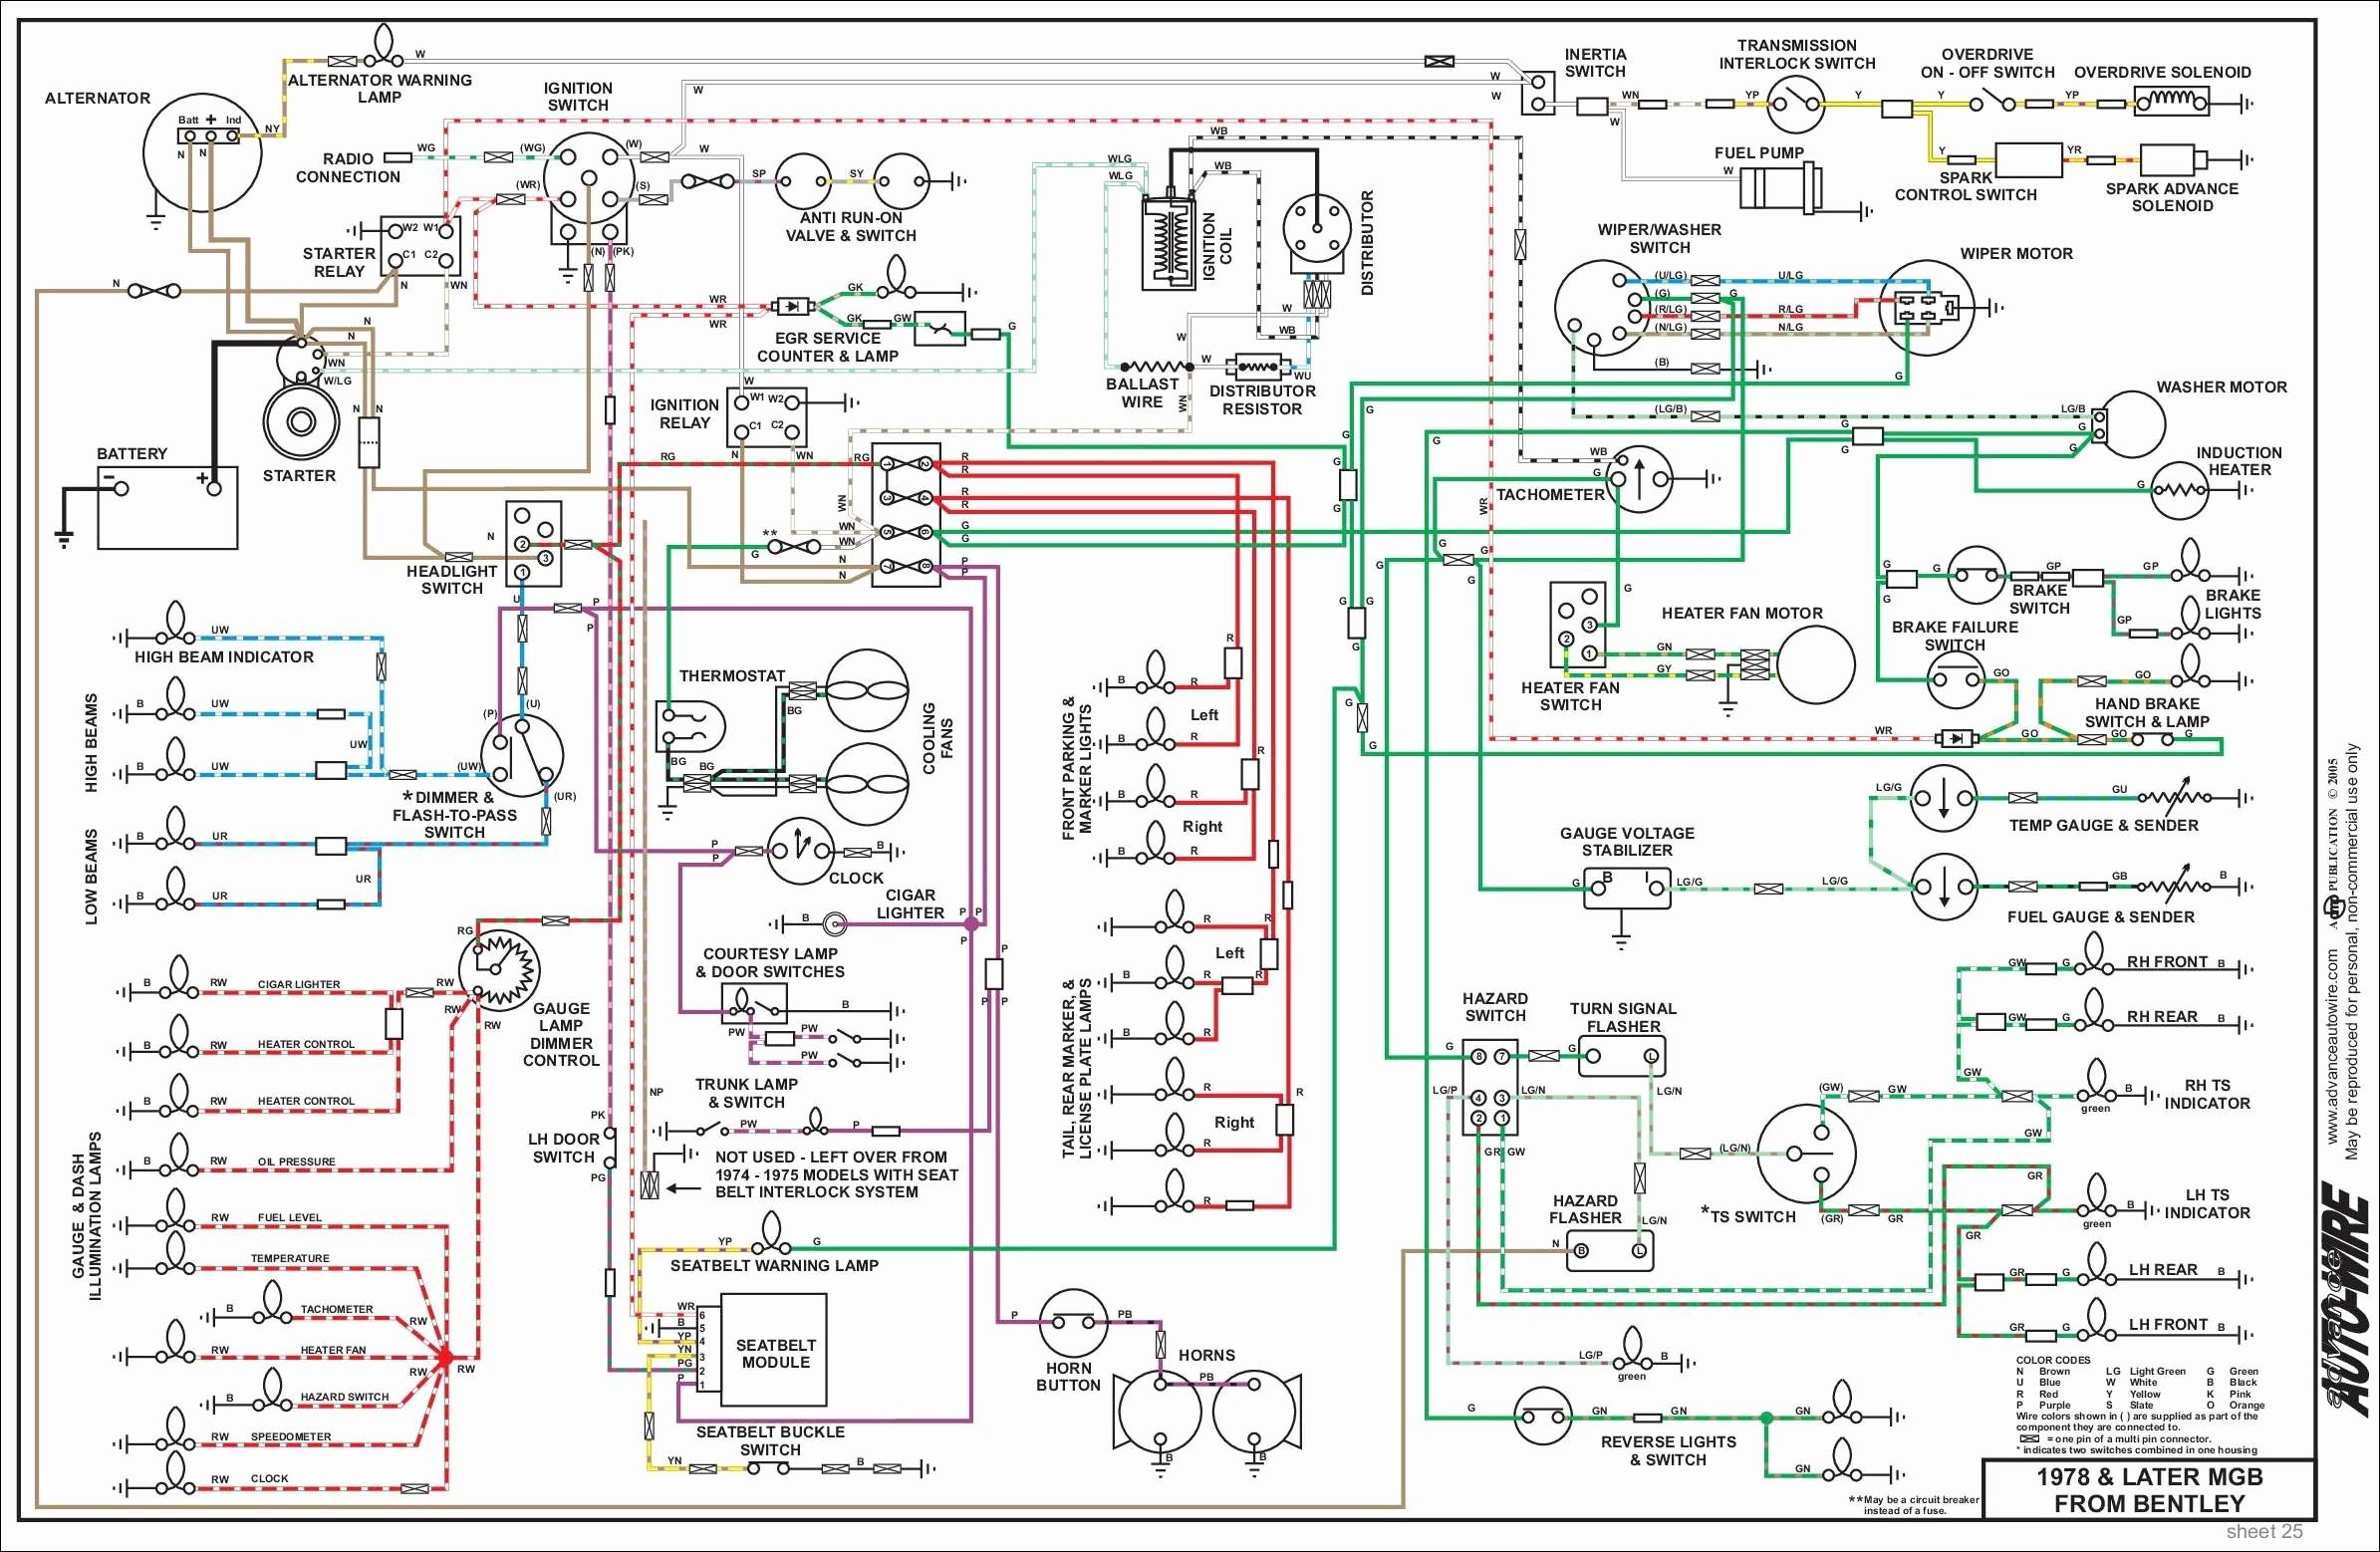 Wiring Diagram for Turn Signal Flasher Mga Turn Signal Wiring Diagram 15 13nualuniverse • Of Wiring Diagram for Turn Signal Flasher